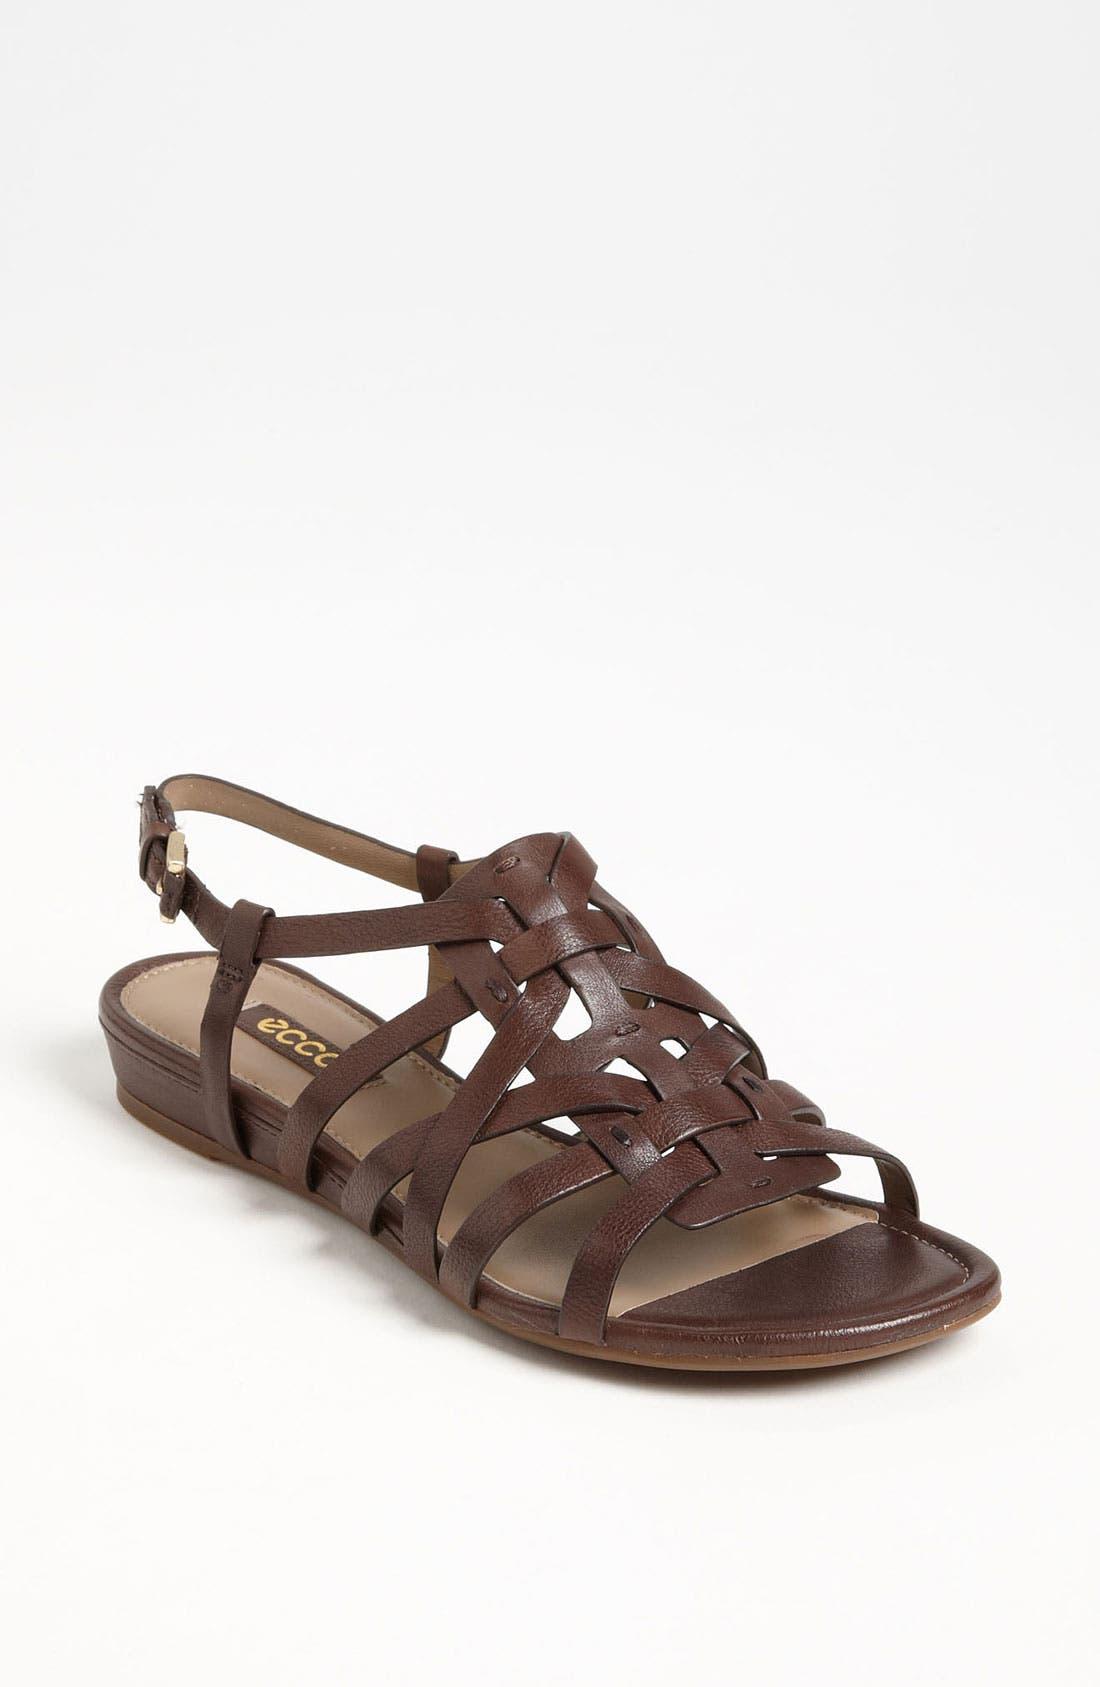 Alternate Image 1 Selected - ECCO 'Odense' Roman Sandal